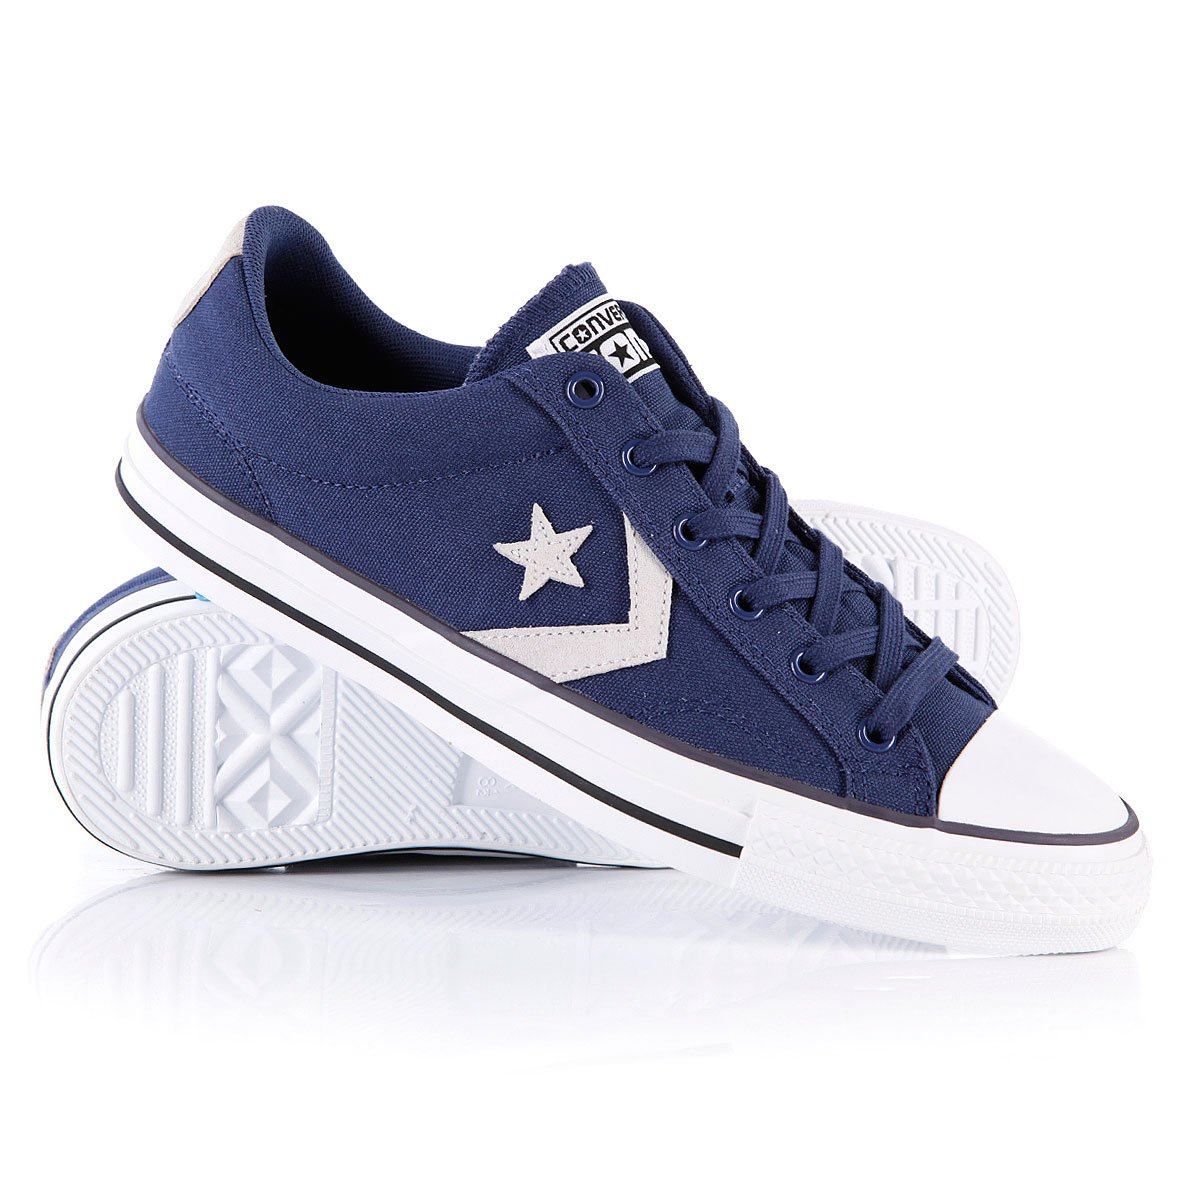 35619ed565e Купить кеды Converse Star Player Plus Ox Ensign Blue в интернет ...